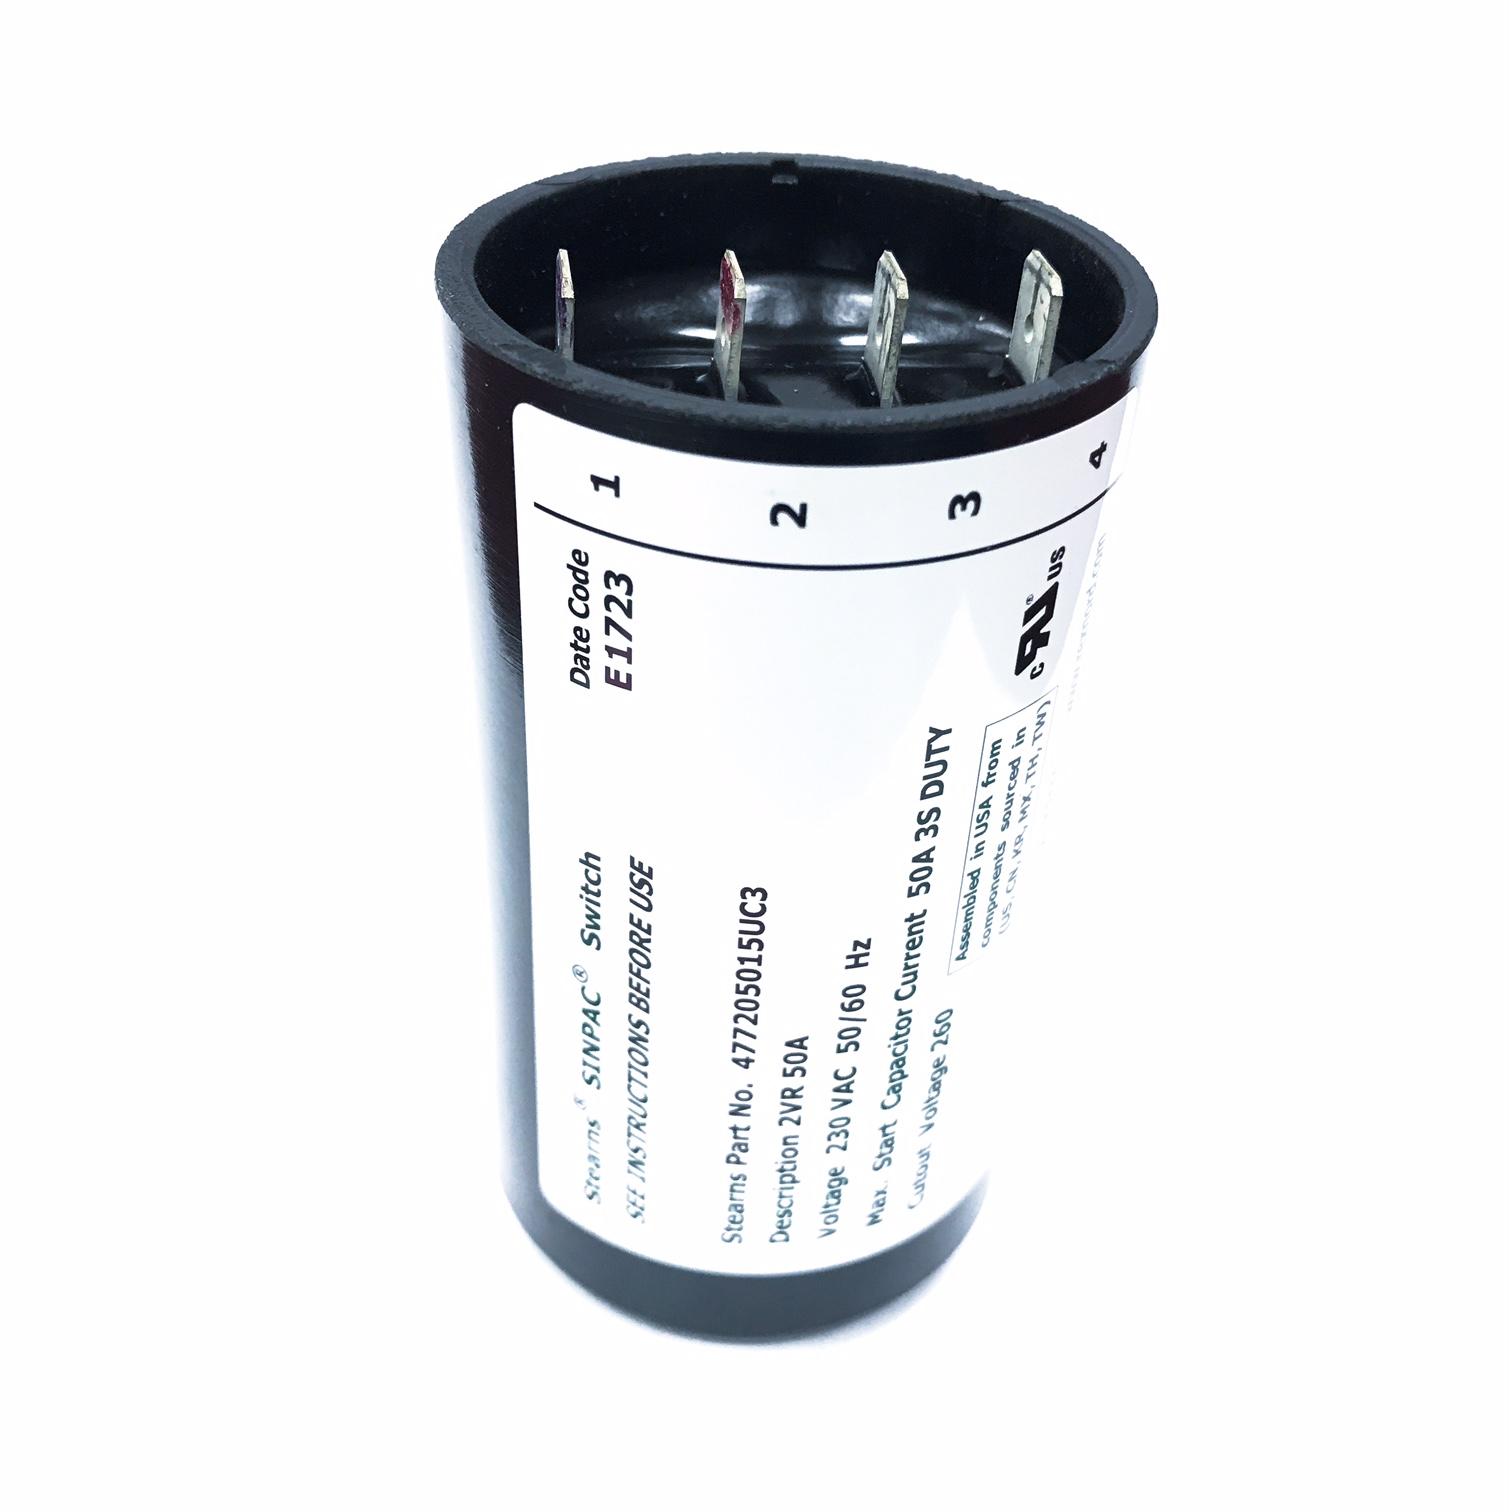 hight resolution of oreck xl 2500 wiring diagram wiring diagrams img oreck xl schematics oreck xl 2500 wiring diagram